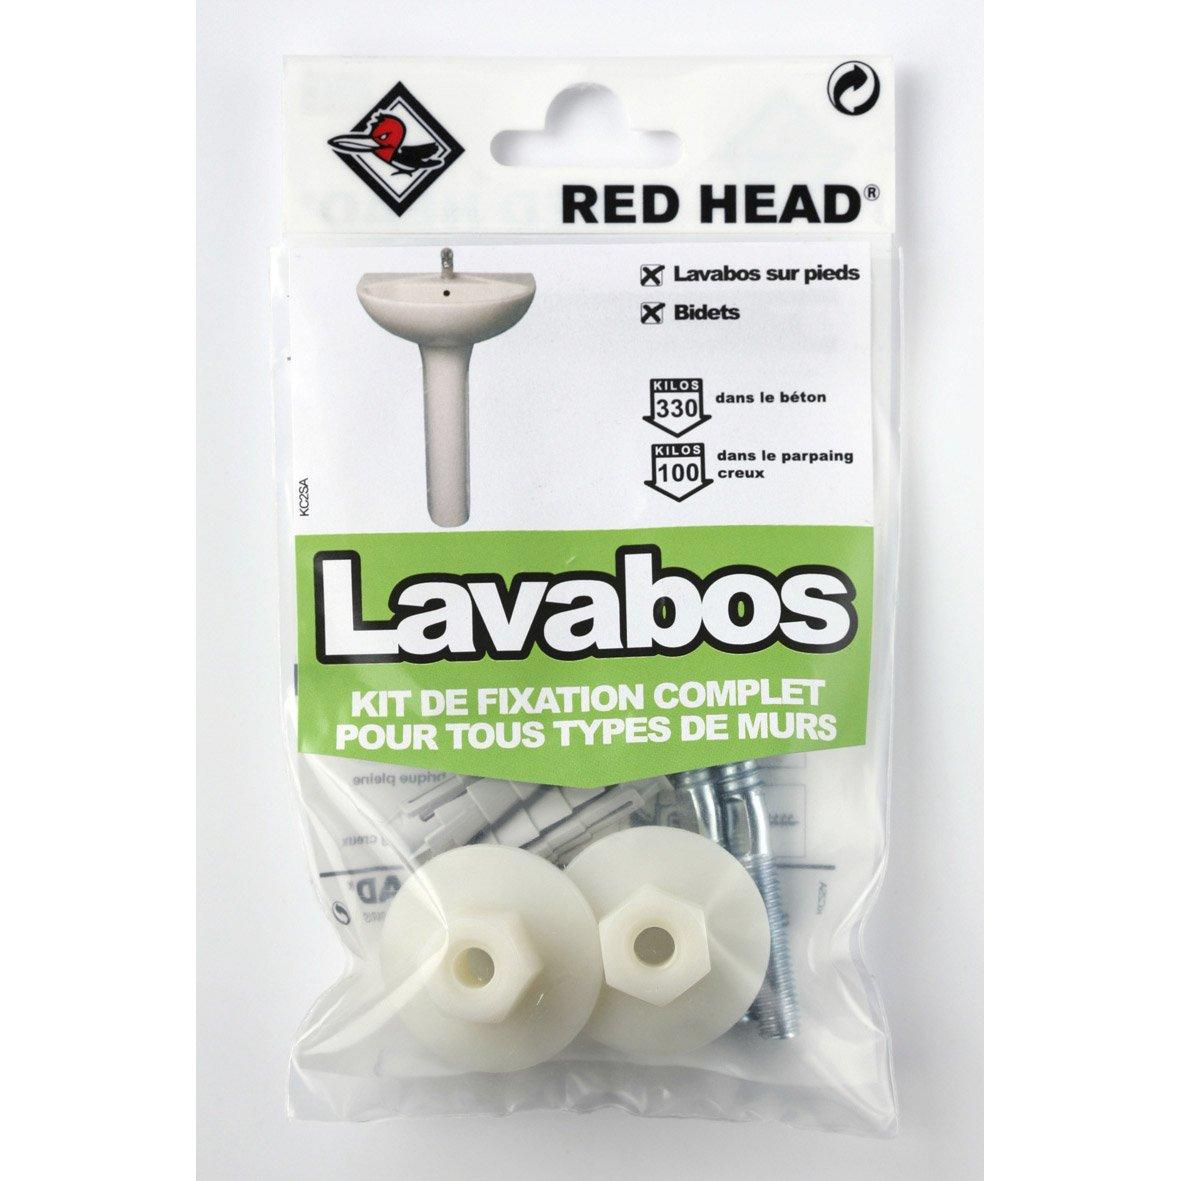 kit chevilles expansion lavabo red head x. Black Bedroom Furniture Sets. Home Design Ideas